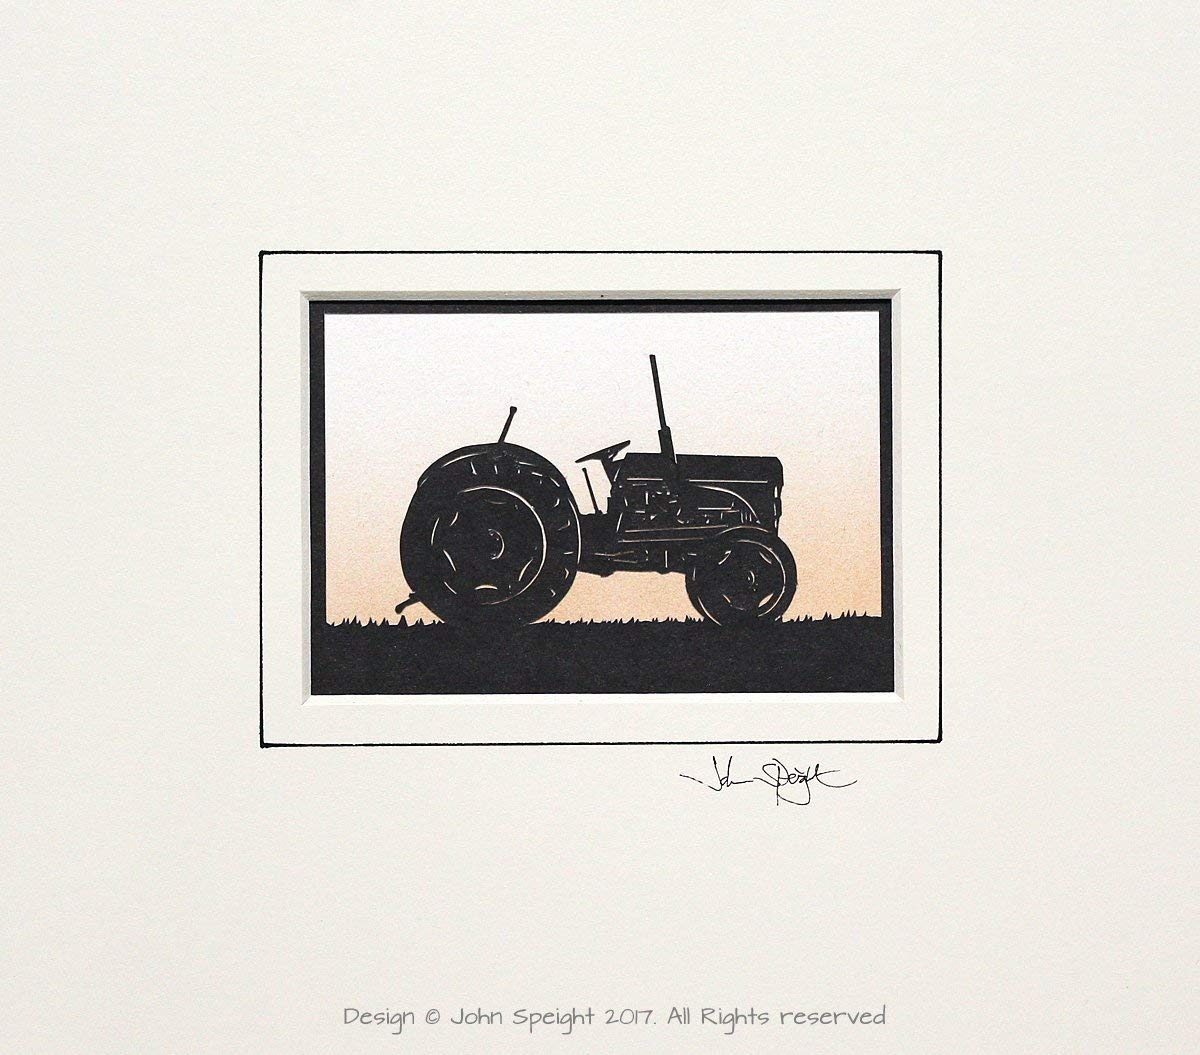 Gift for him FergusonLittle Grey Fergie Tractor Original Signed Hand Cut Silhouette Papercut Art by John Speight